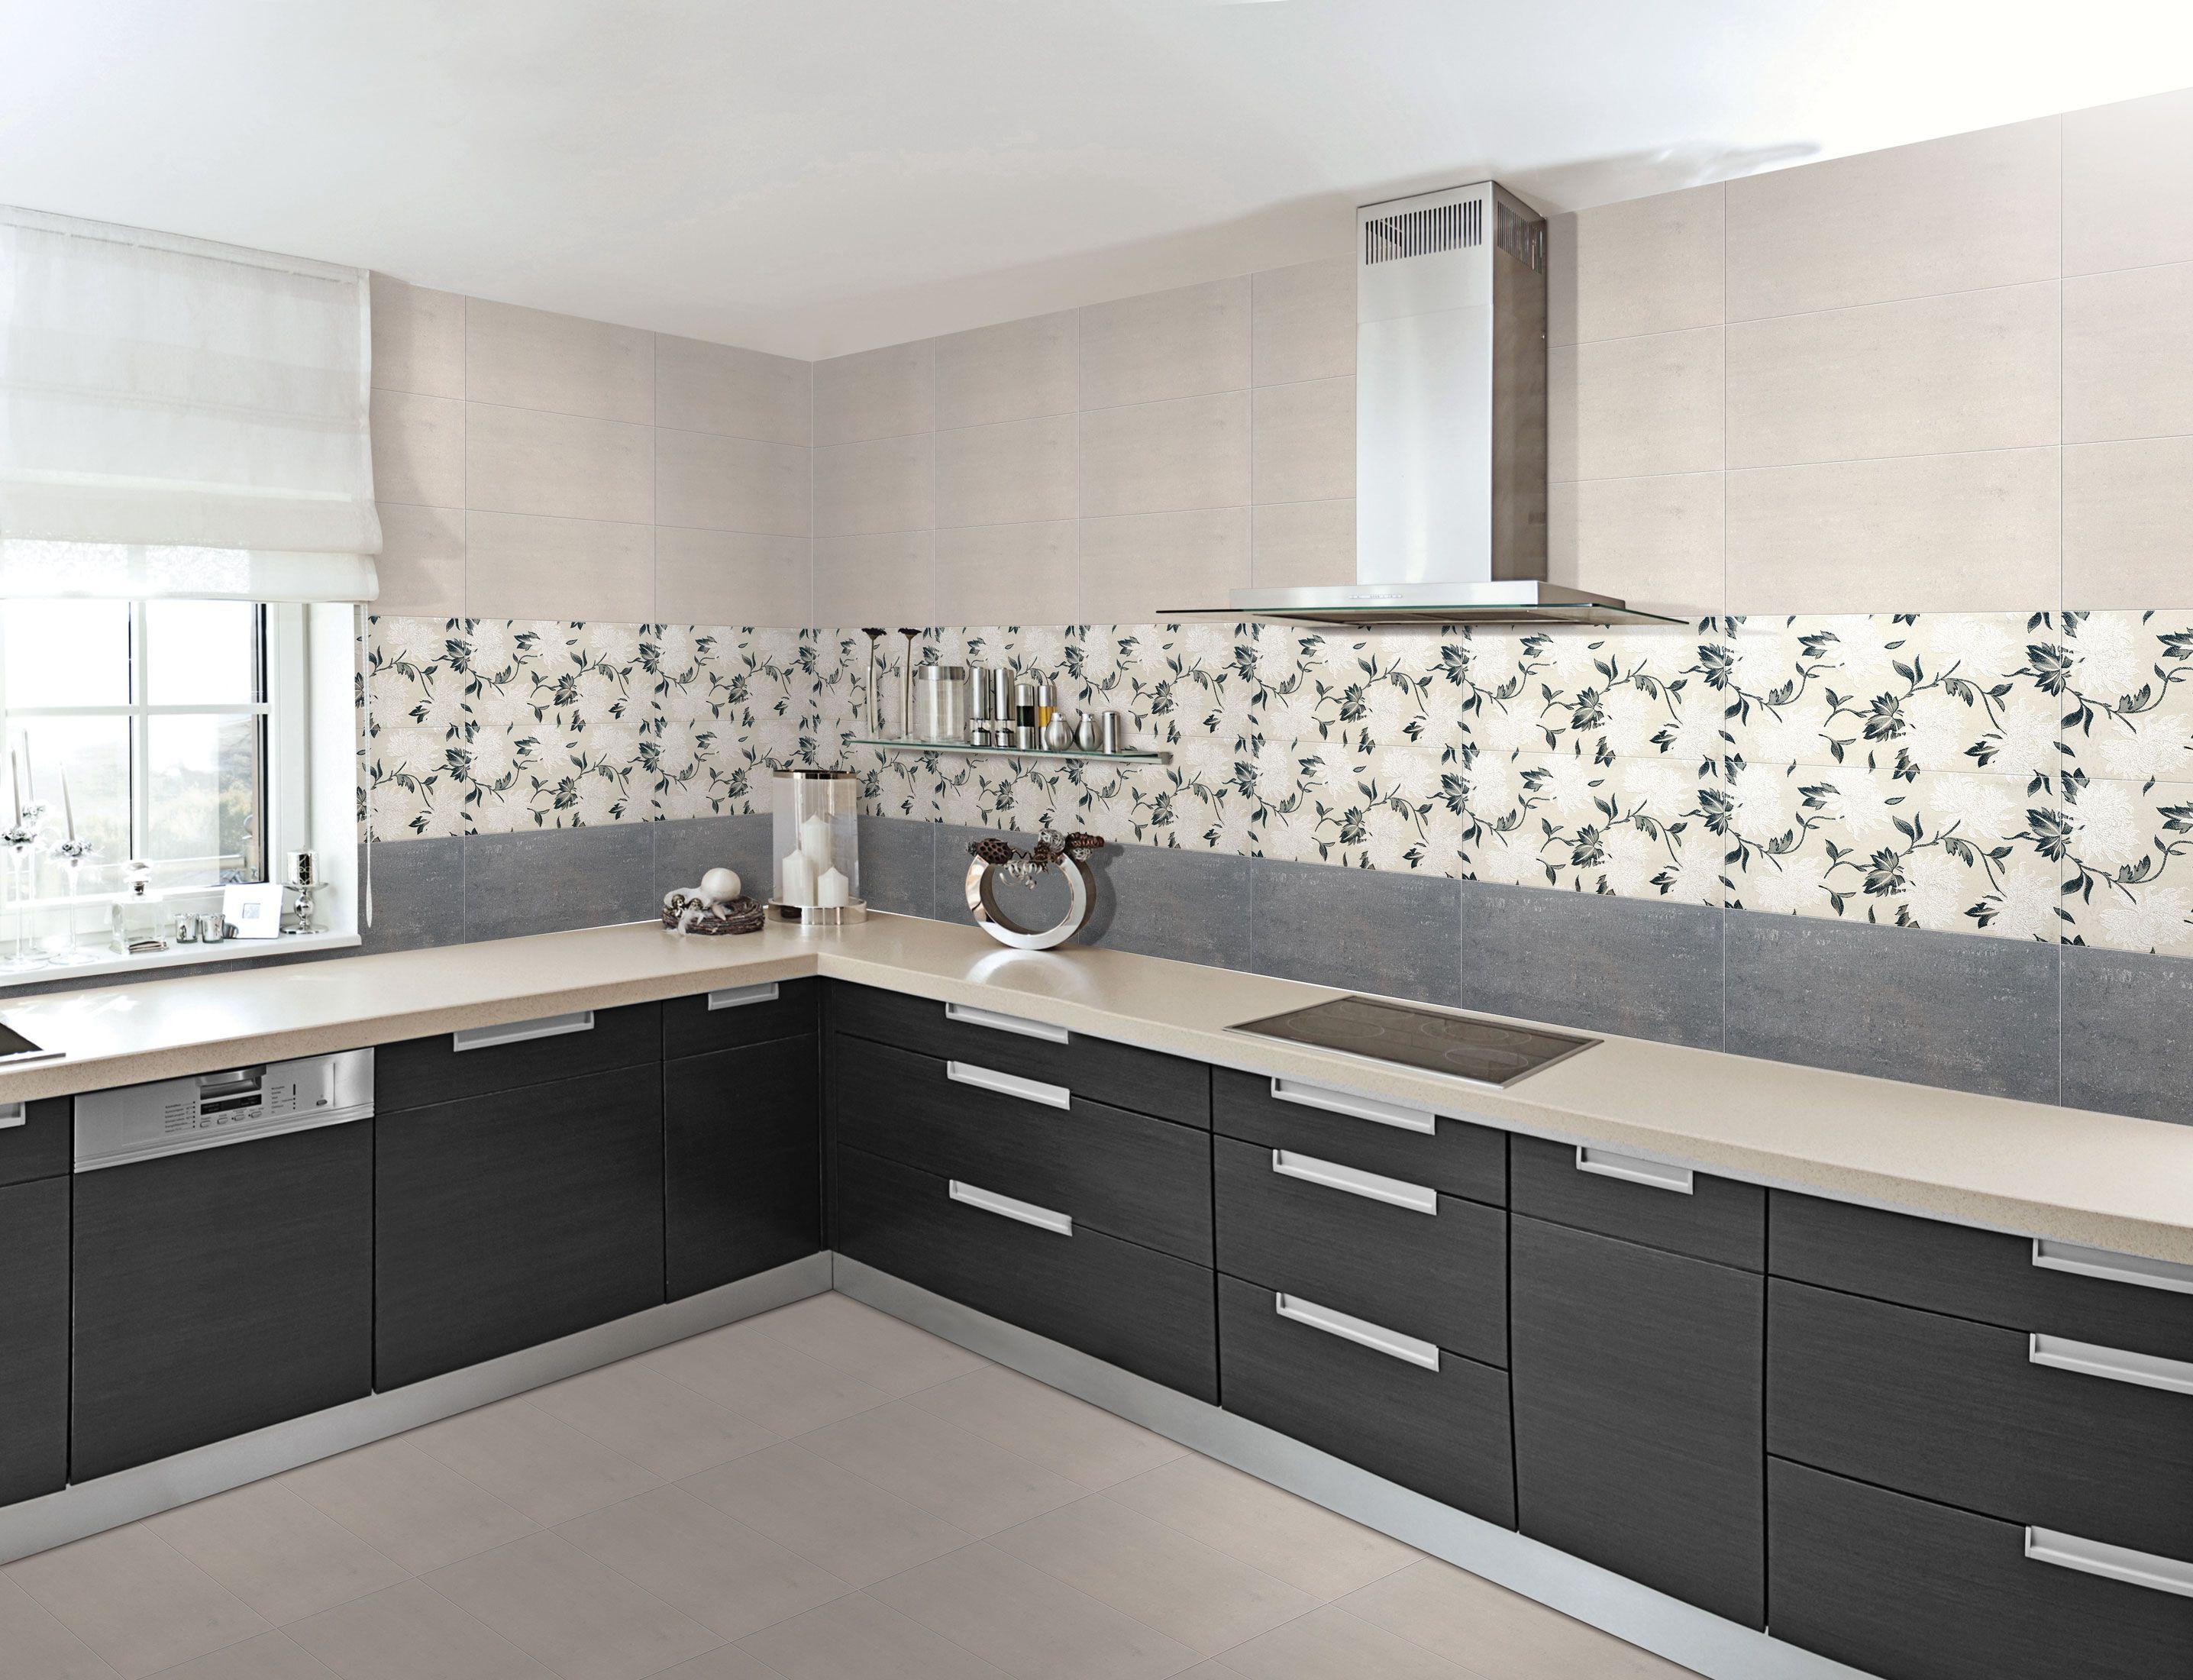 Kitchen Wall Tile Designs Marble Table Buy Designer Floor Tiles For Bathroom Bedroom Living Room Office Vitrified Exterior Ceramic Online India